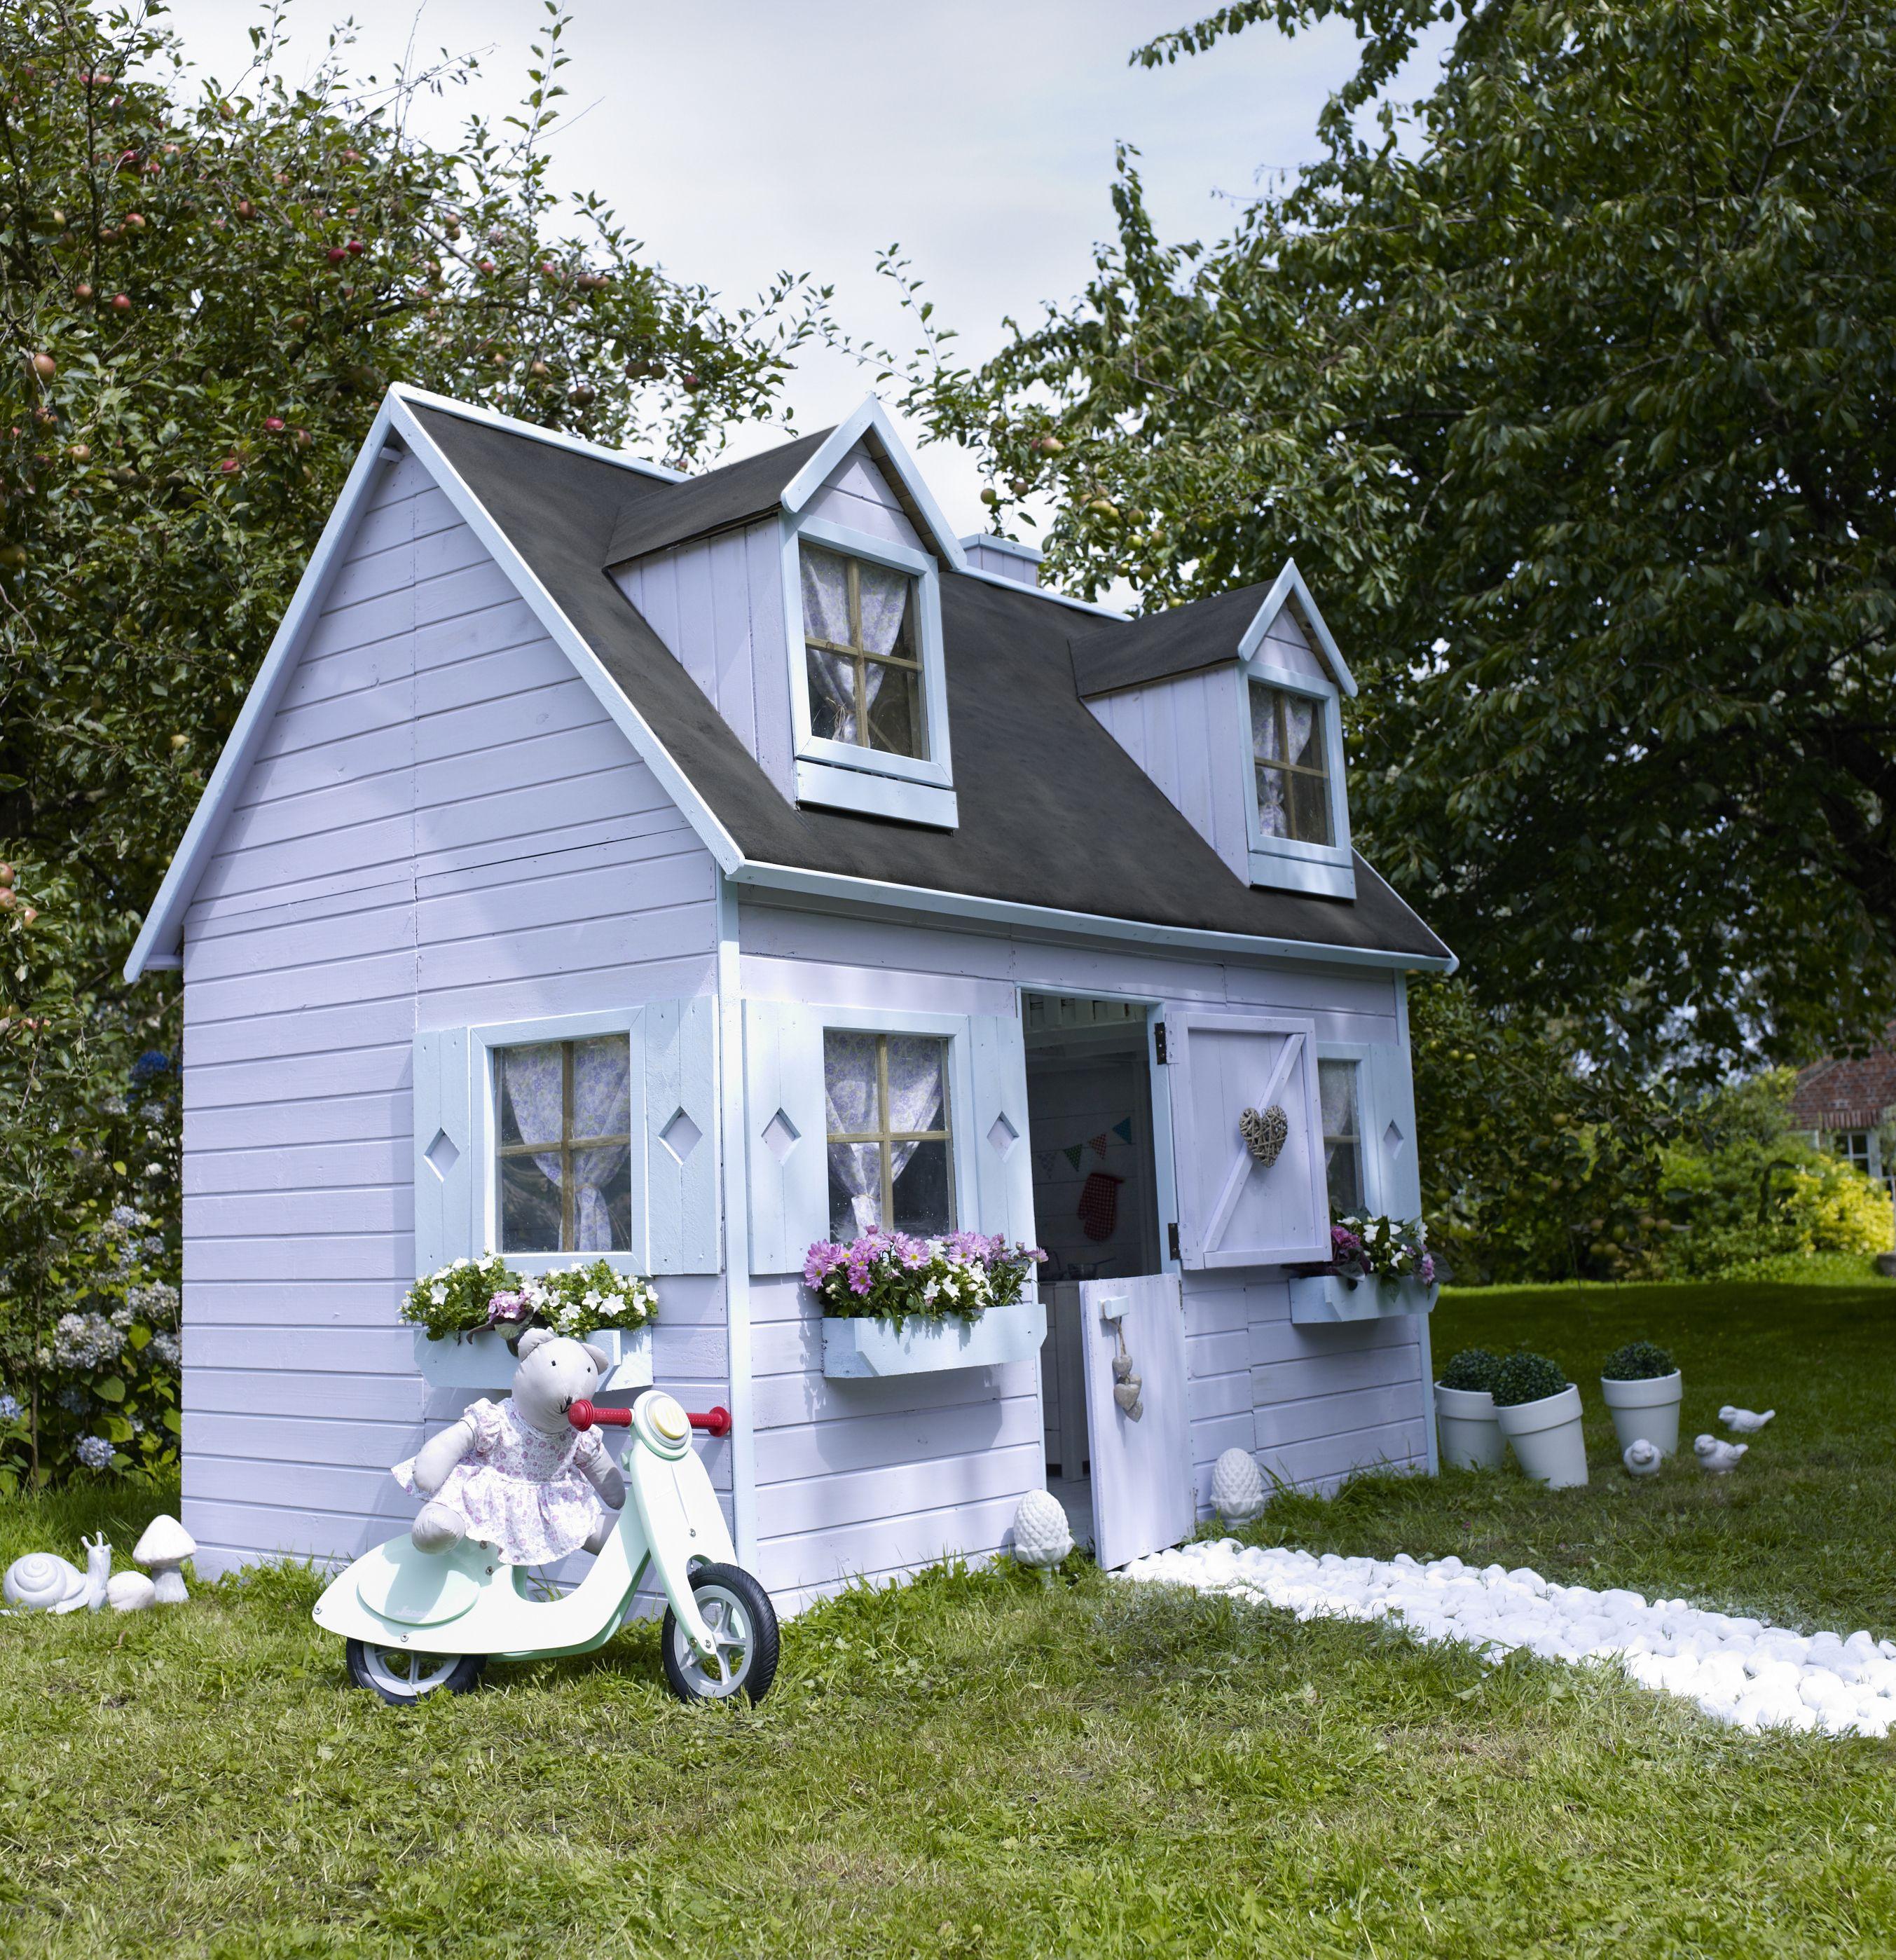 maisonnette rosalie castorama cabanes d 39 enfants d. Black Bedroom Furniture Sets. Home Design Ideas